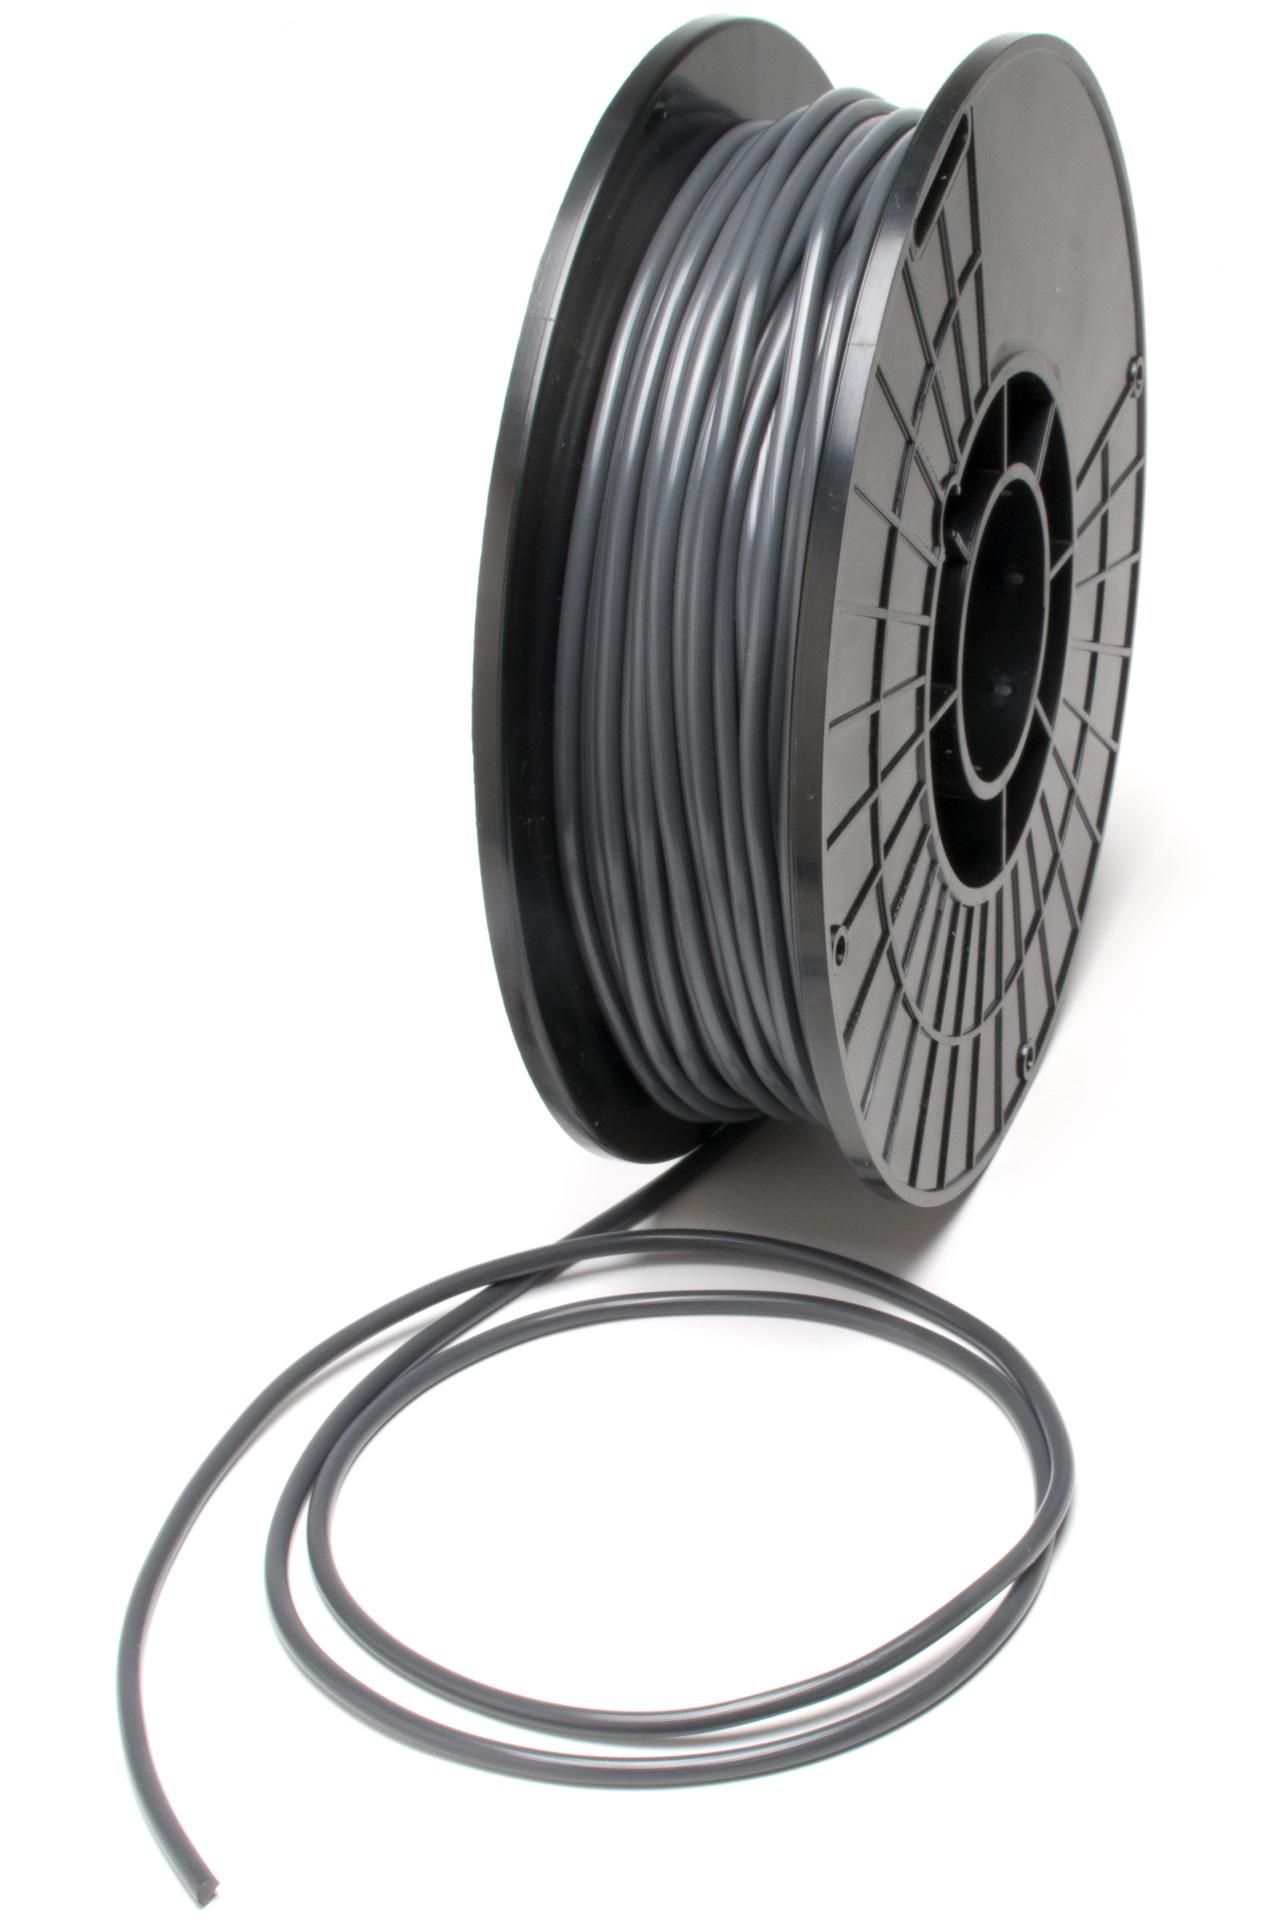 Transit welding cord in black